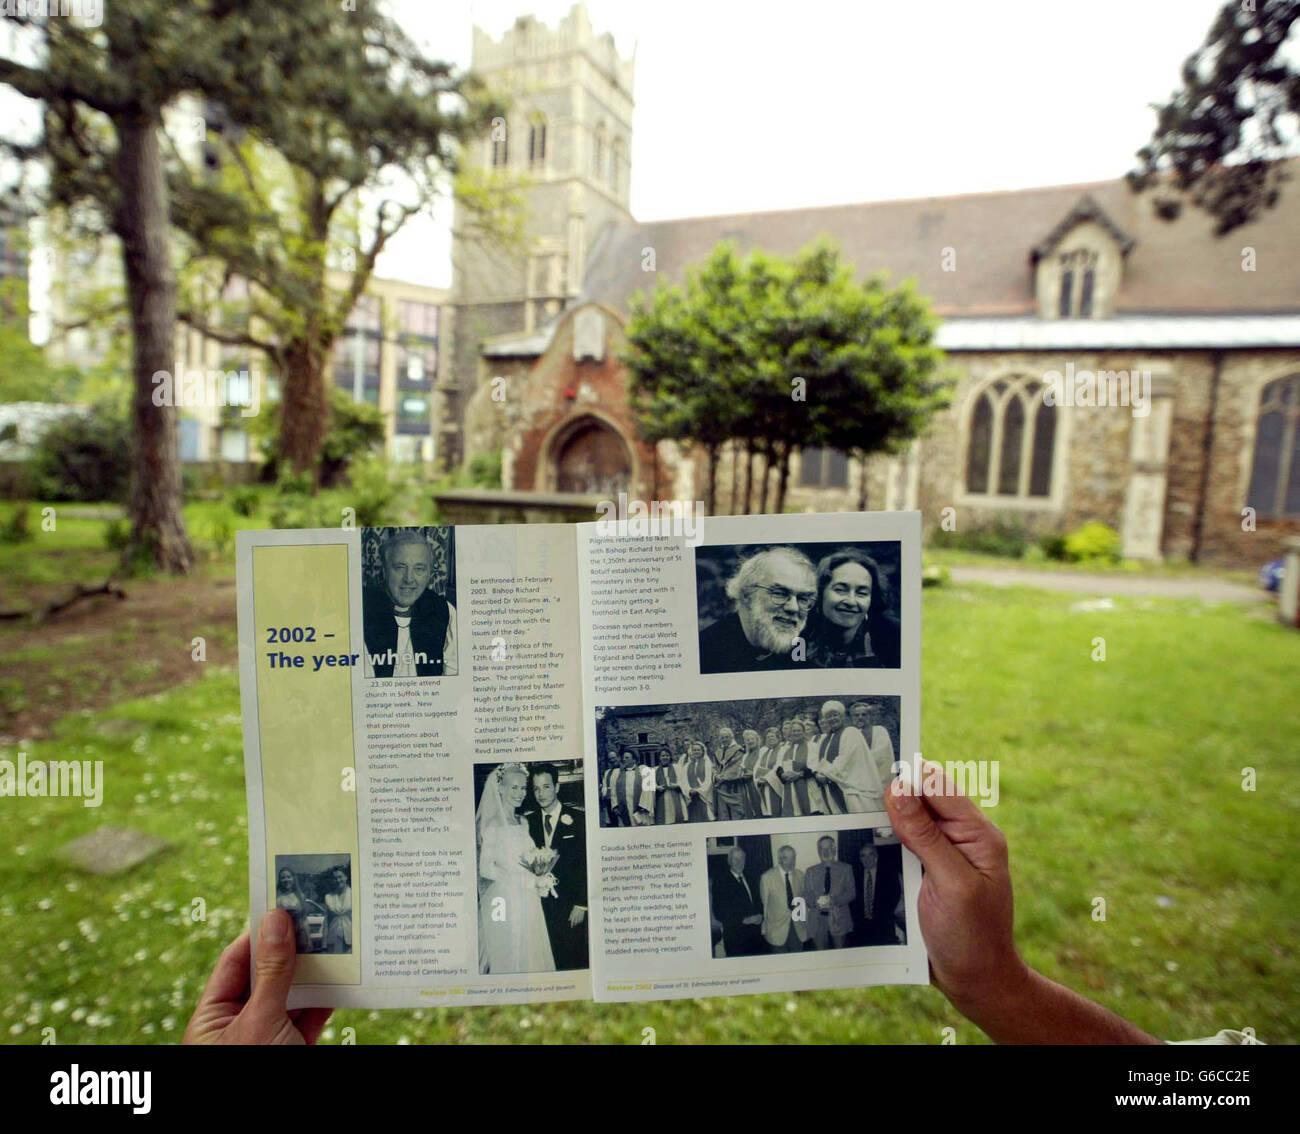 Clarke - Schiffer & Vaughan Wedding Photo - Stock Image